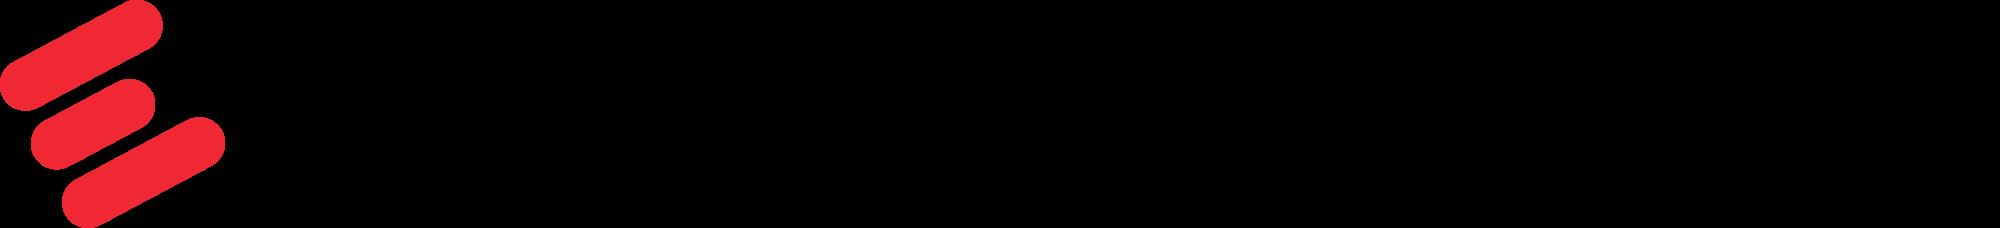 Esmail Corp